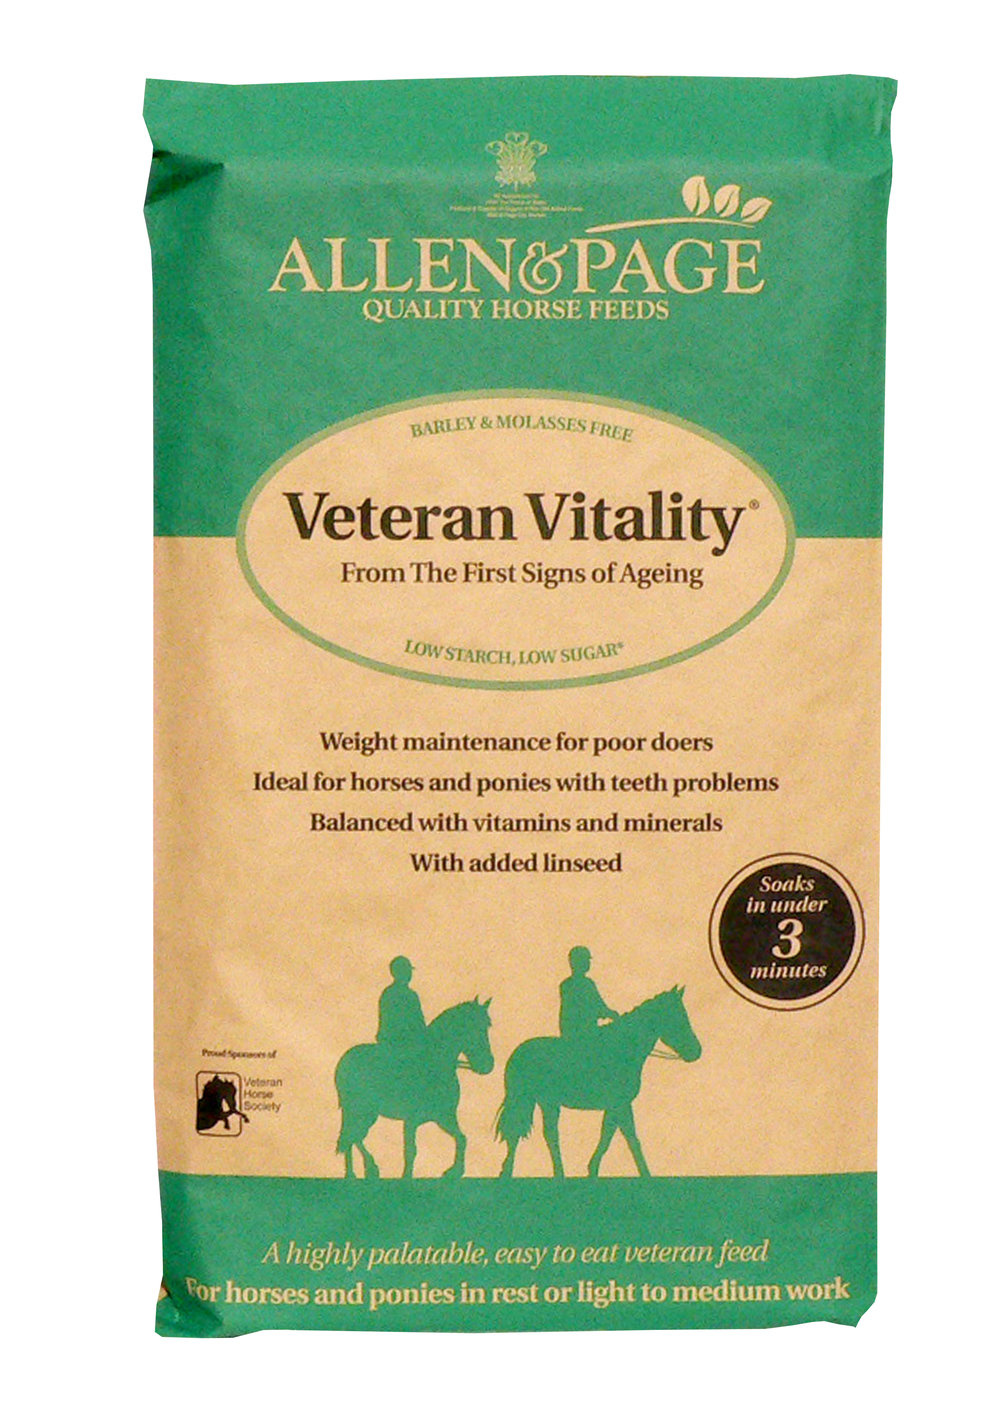 Veteran Vitality new 2015.jpg